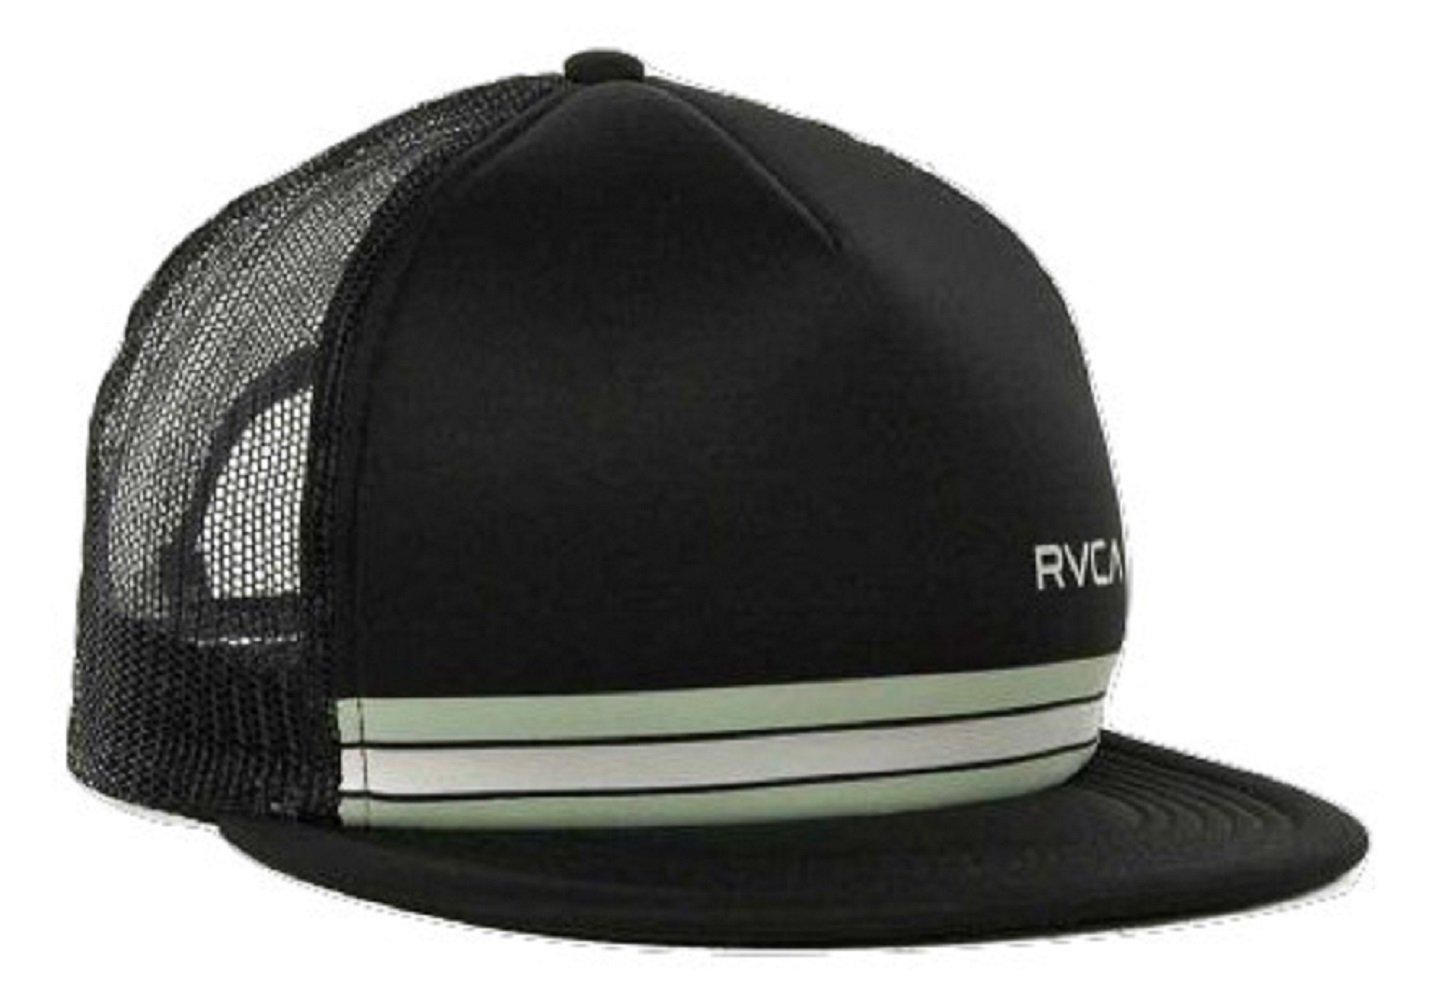 Soporte de Barlow Rvca ala Trucker de malla sombrero gorra Negro ...